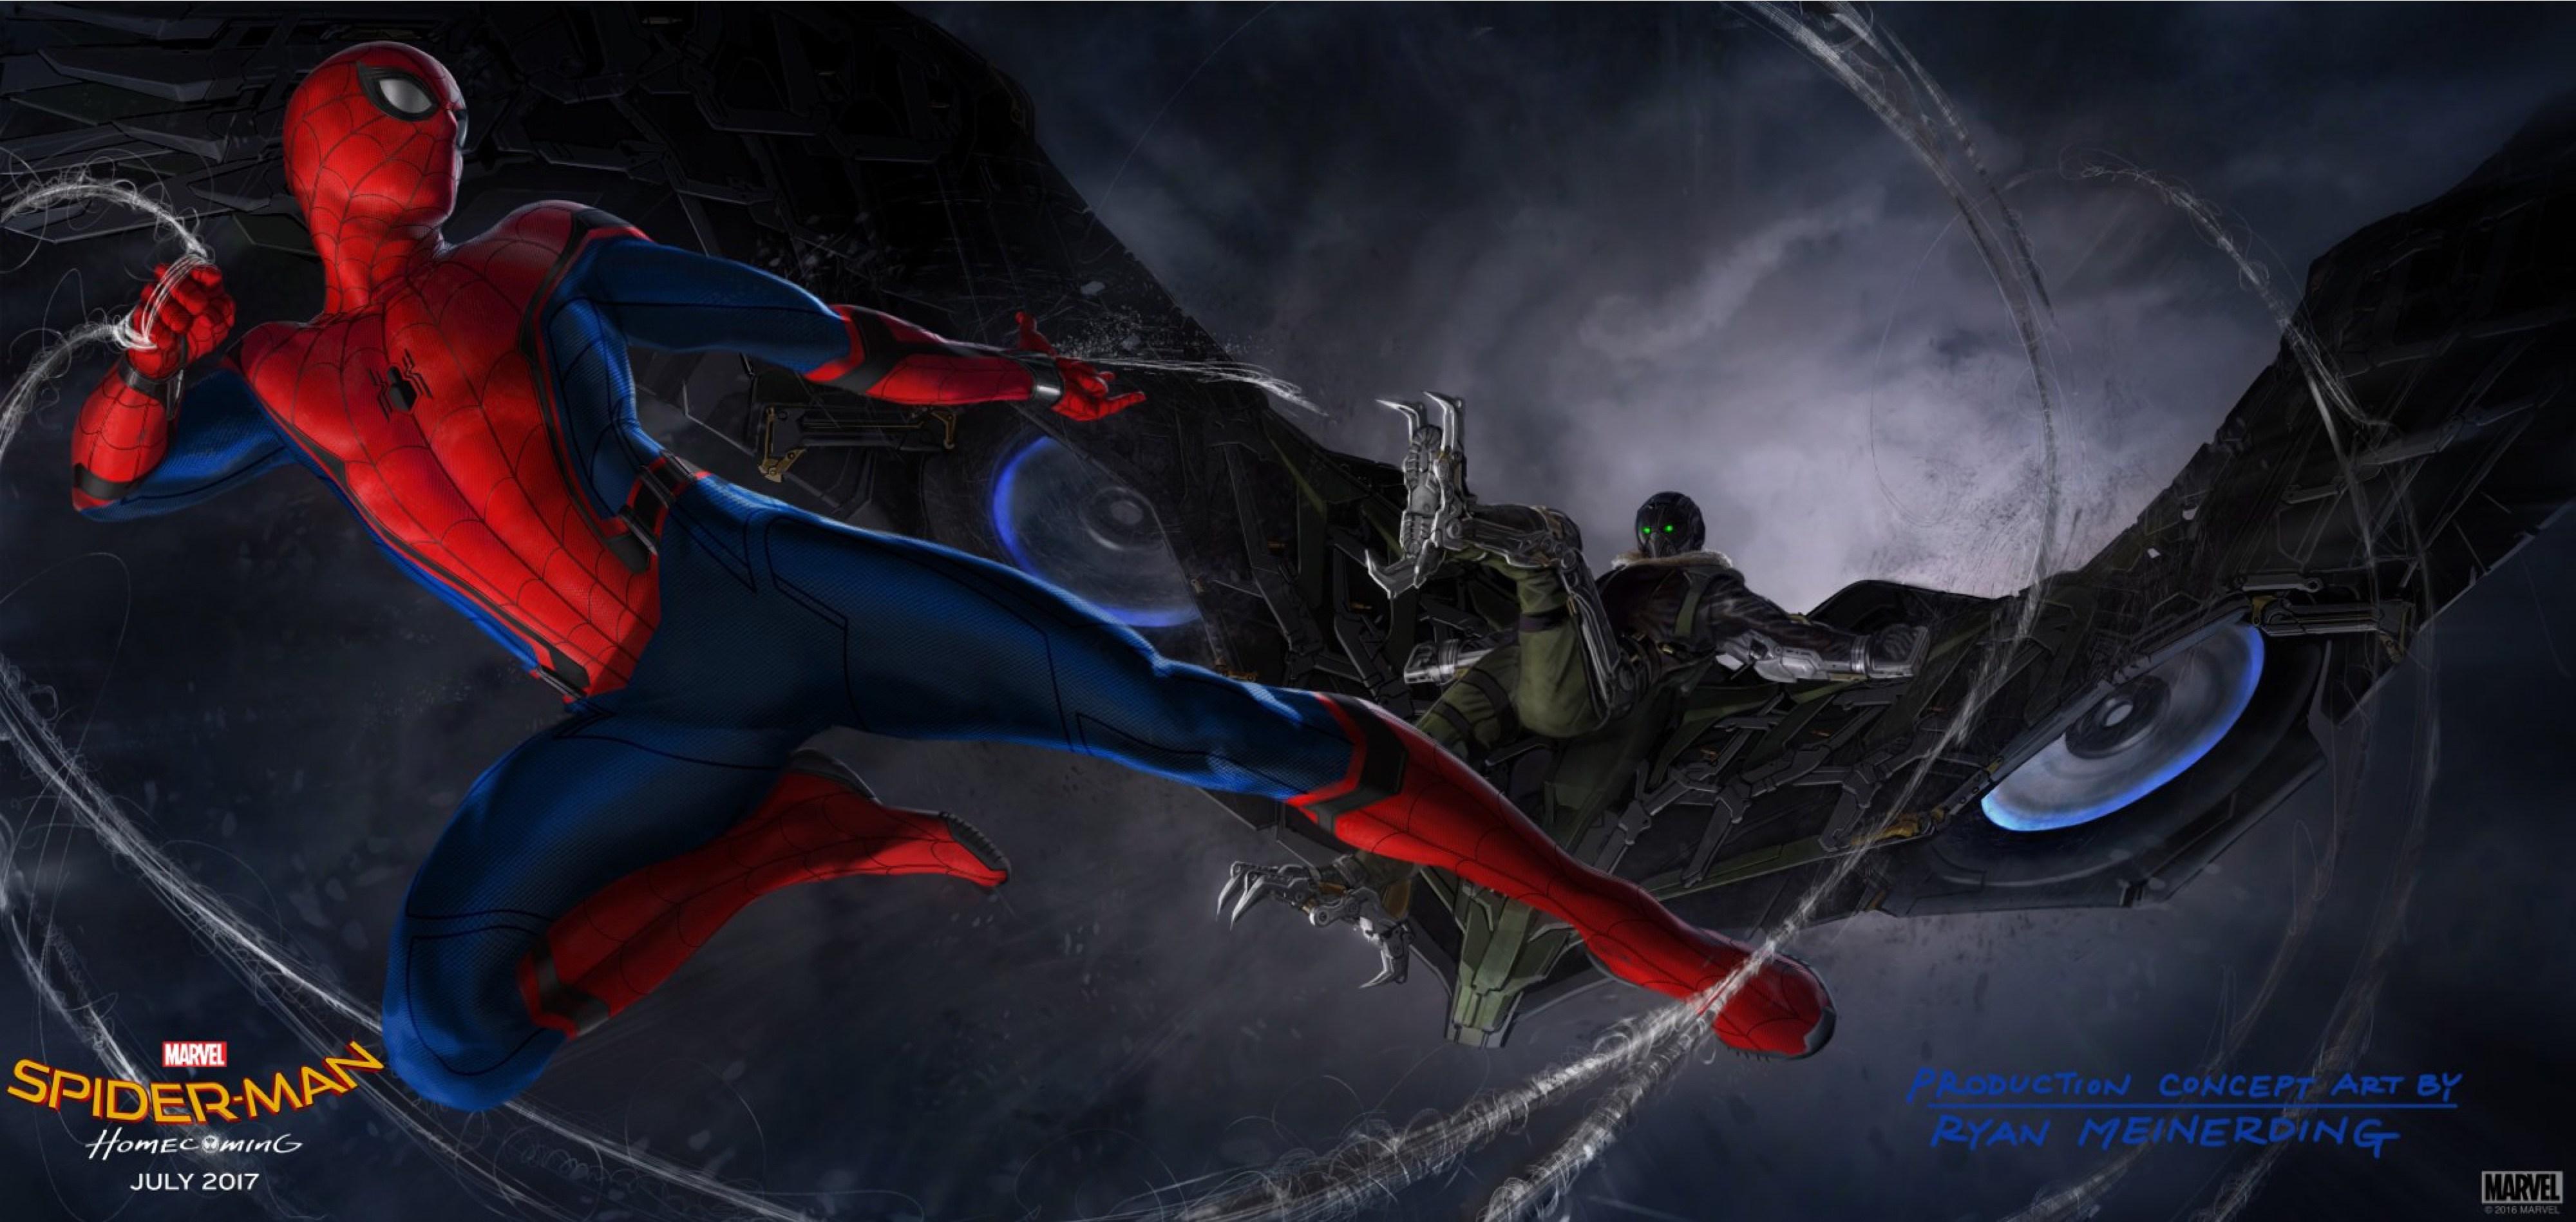 Spider-Man: Homecoming, primo sguardo all'Avvoltoio